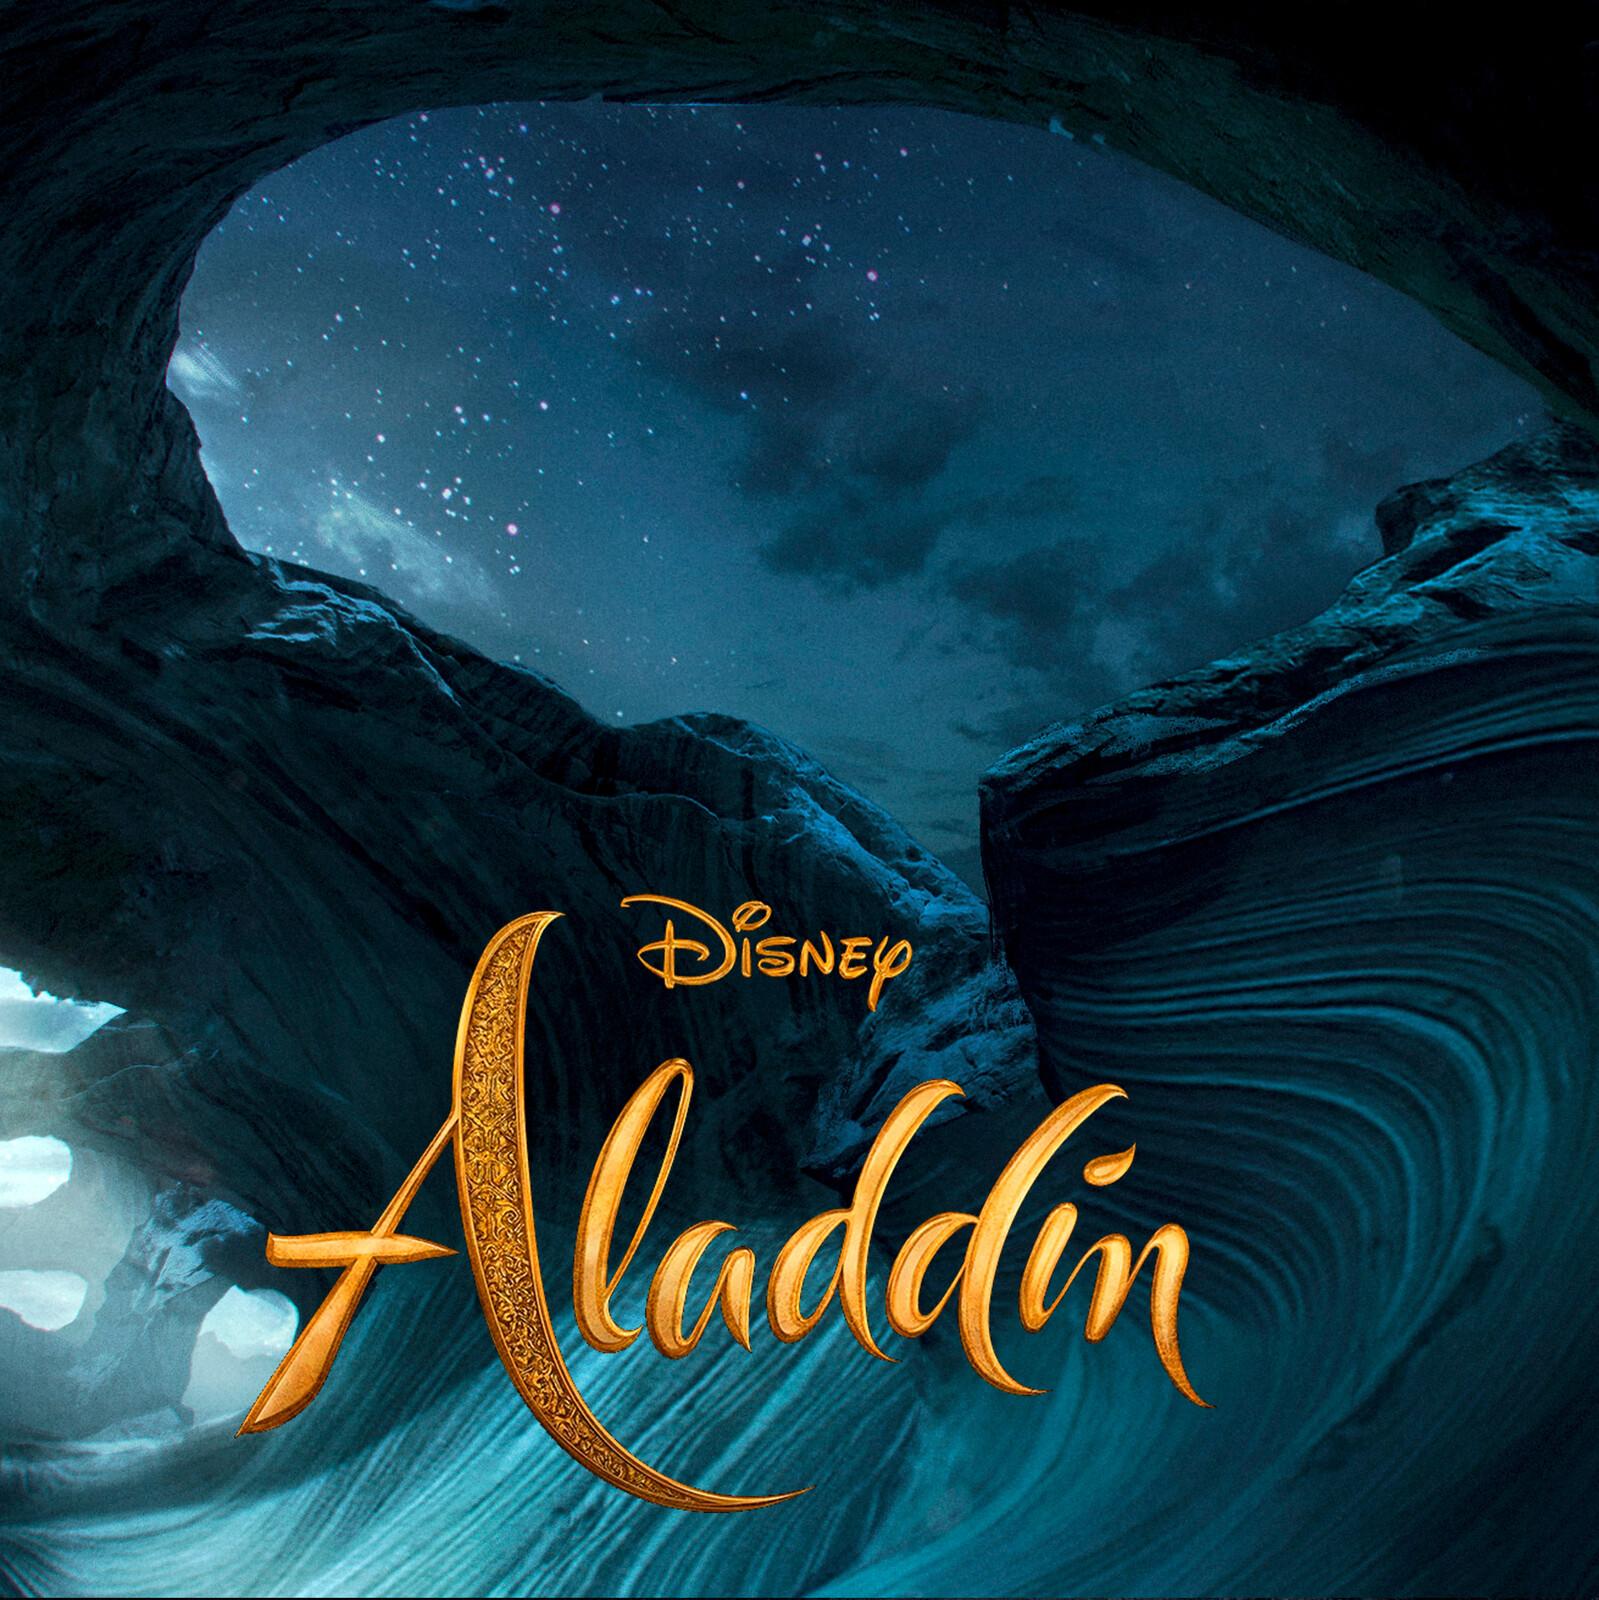 Aladdin 2019 Vfx  A Whole New World